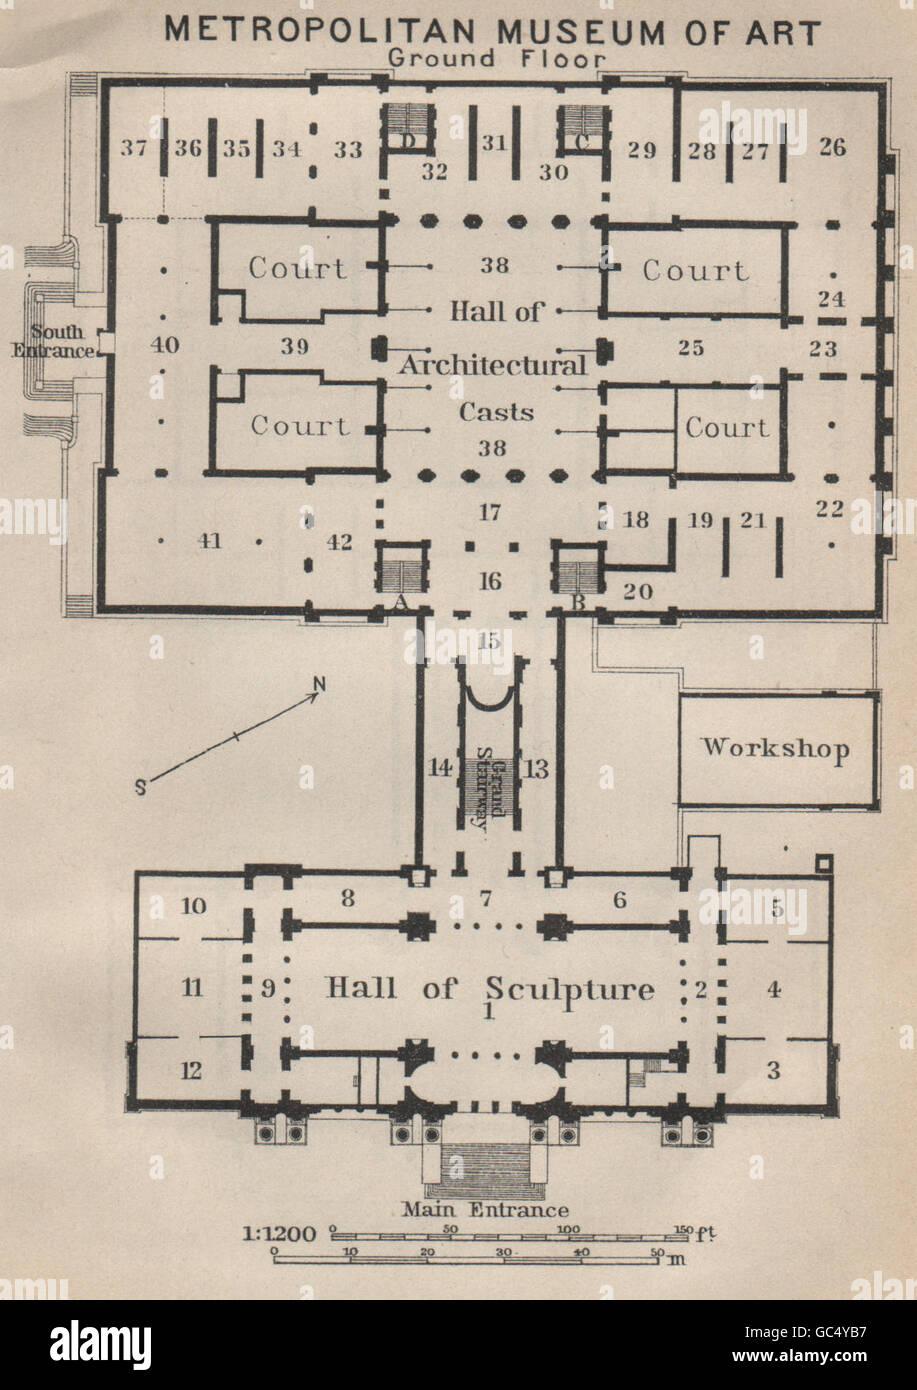 Metropolitan Museum Of Art Ground Floor New York Baedeker 1909 Antique Map Stock Photo Alamy